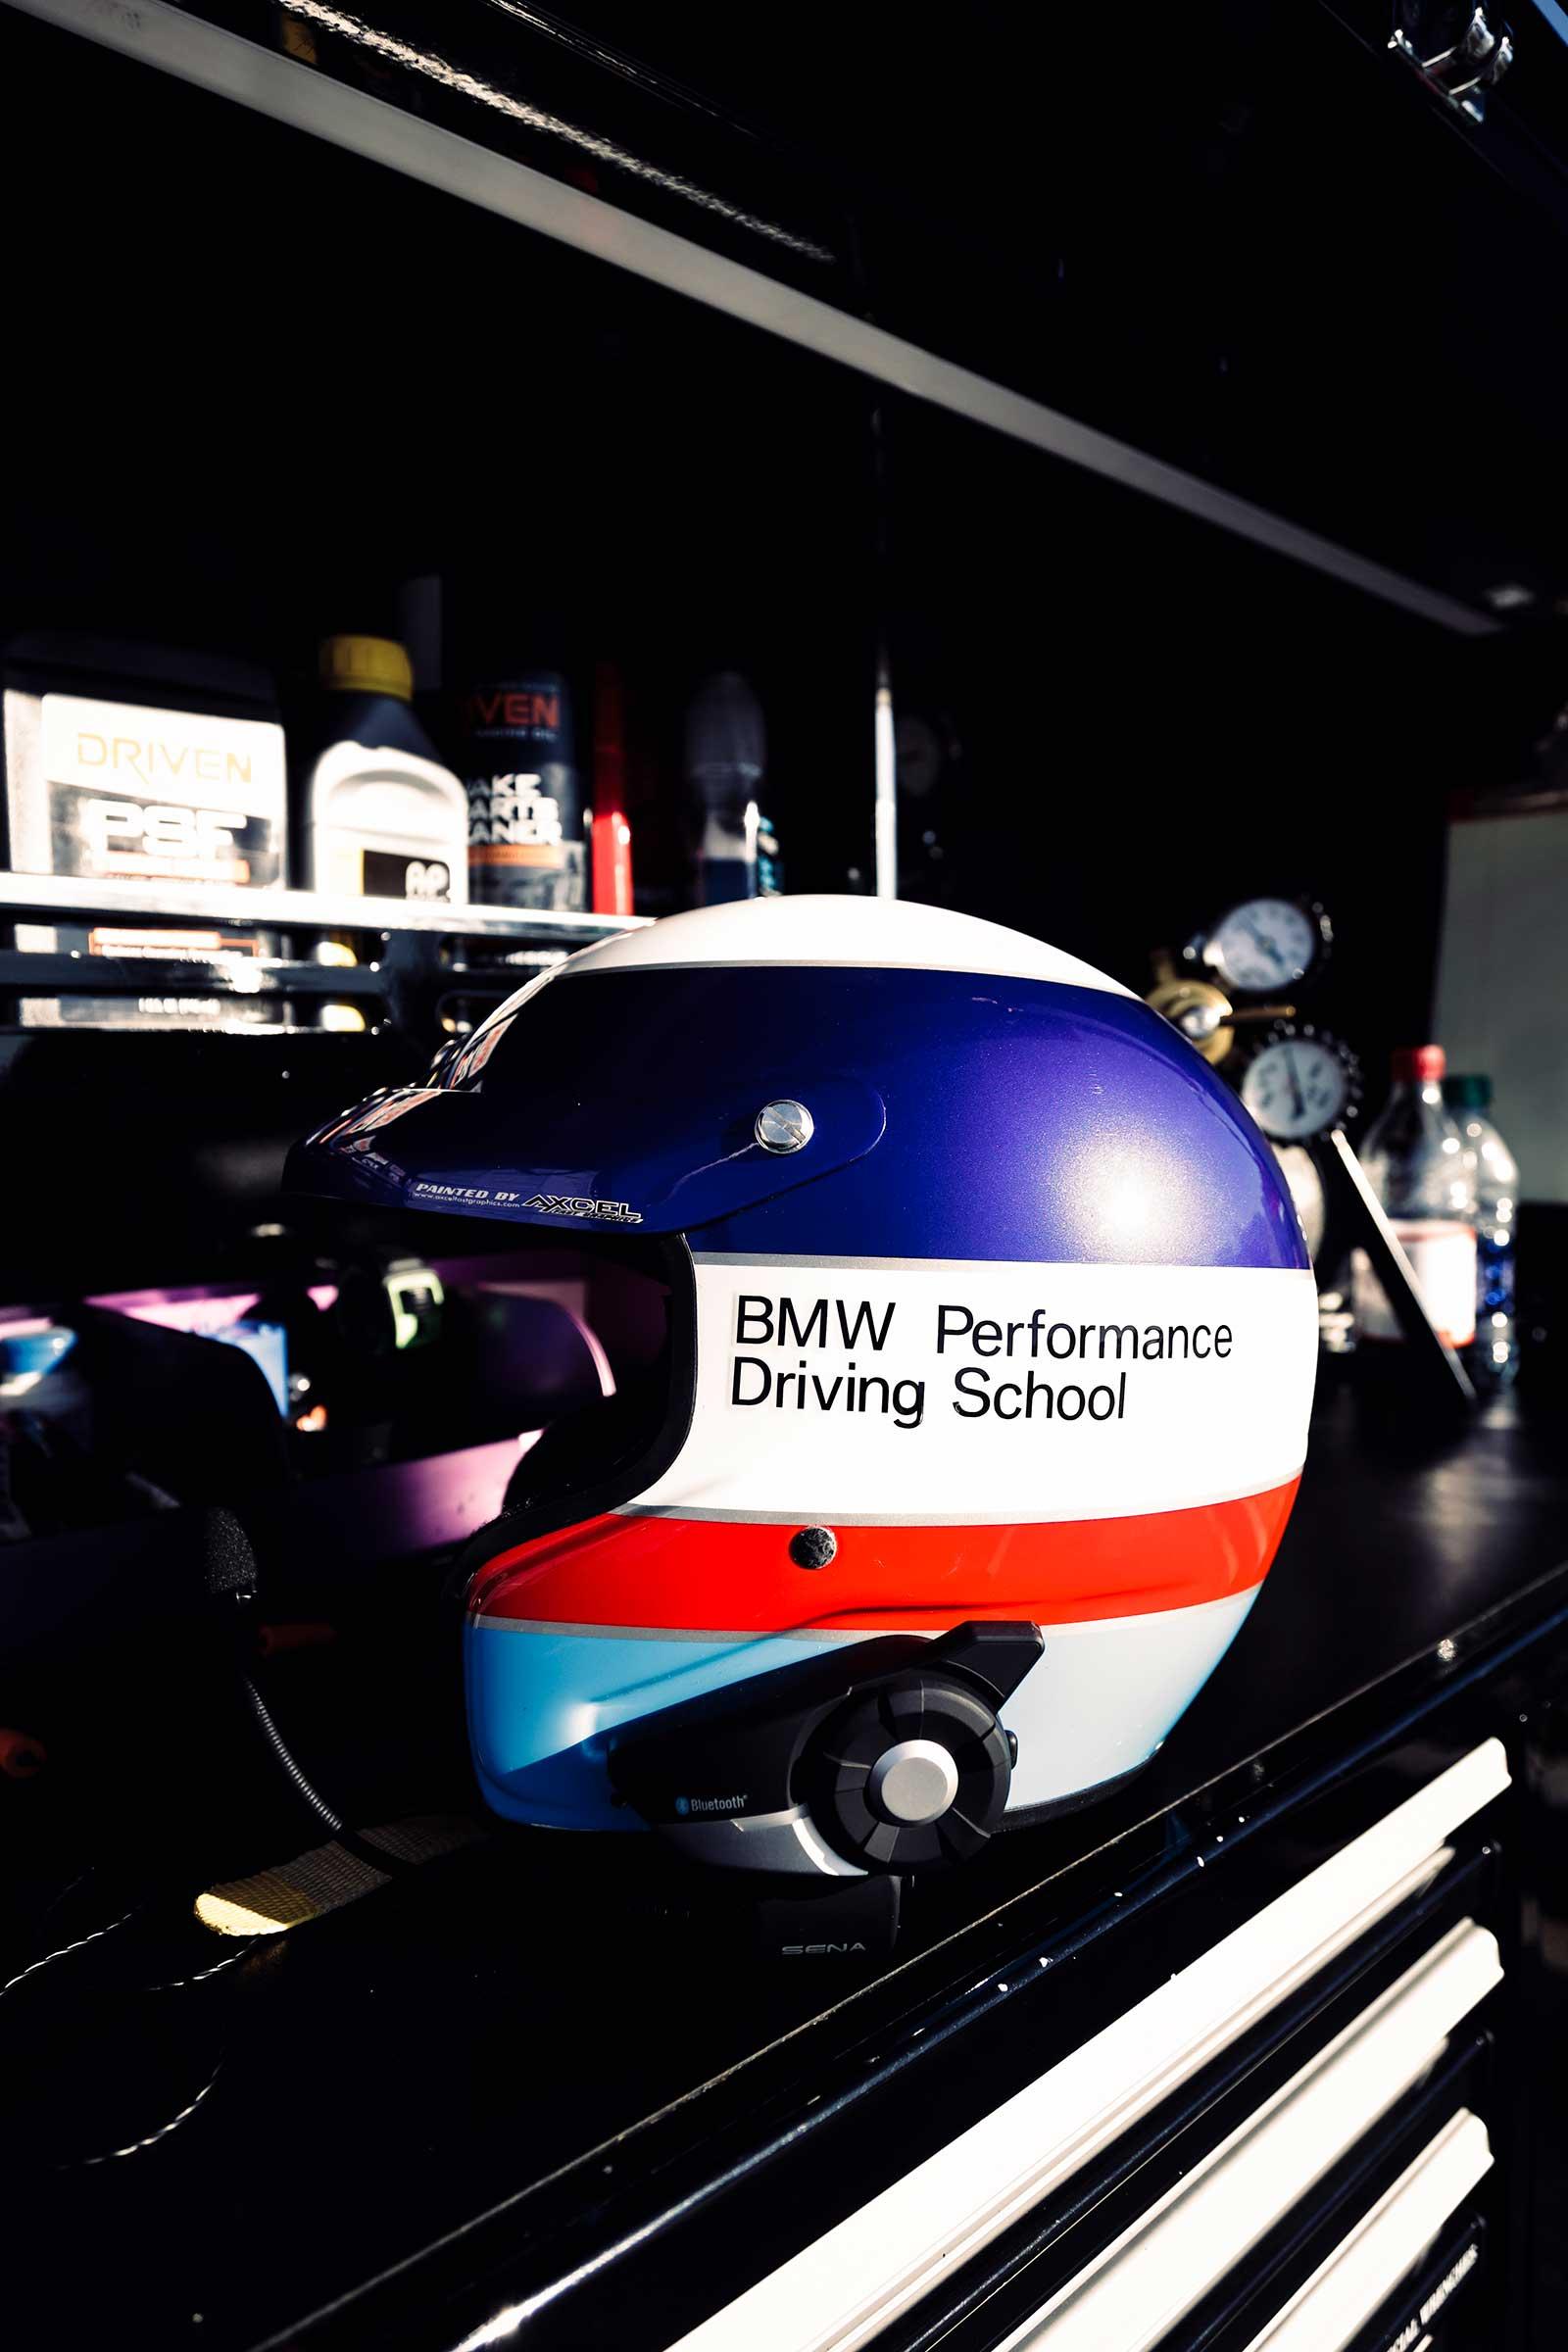 Bmw Performance Center Greer Sc Bmw Sets The Drifting